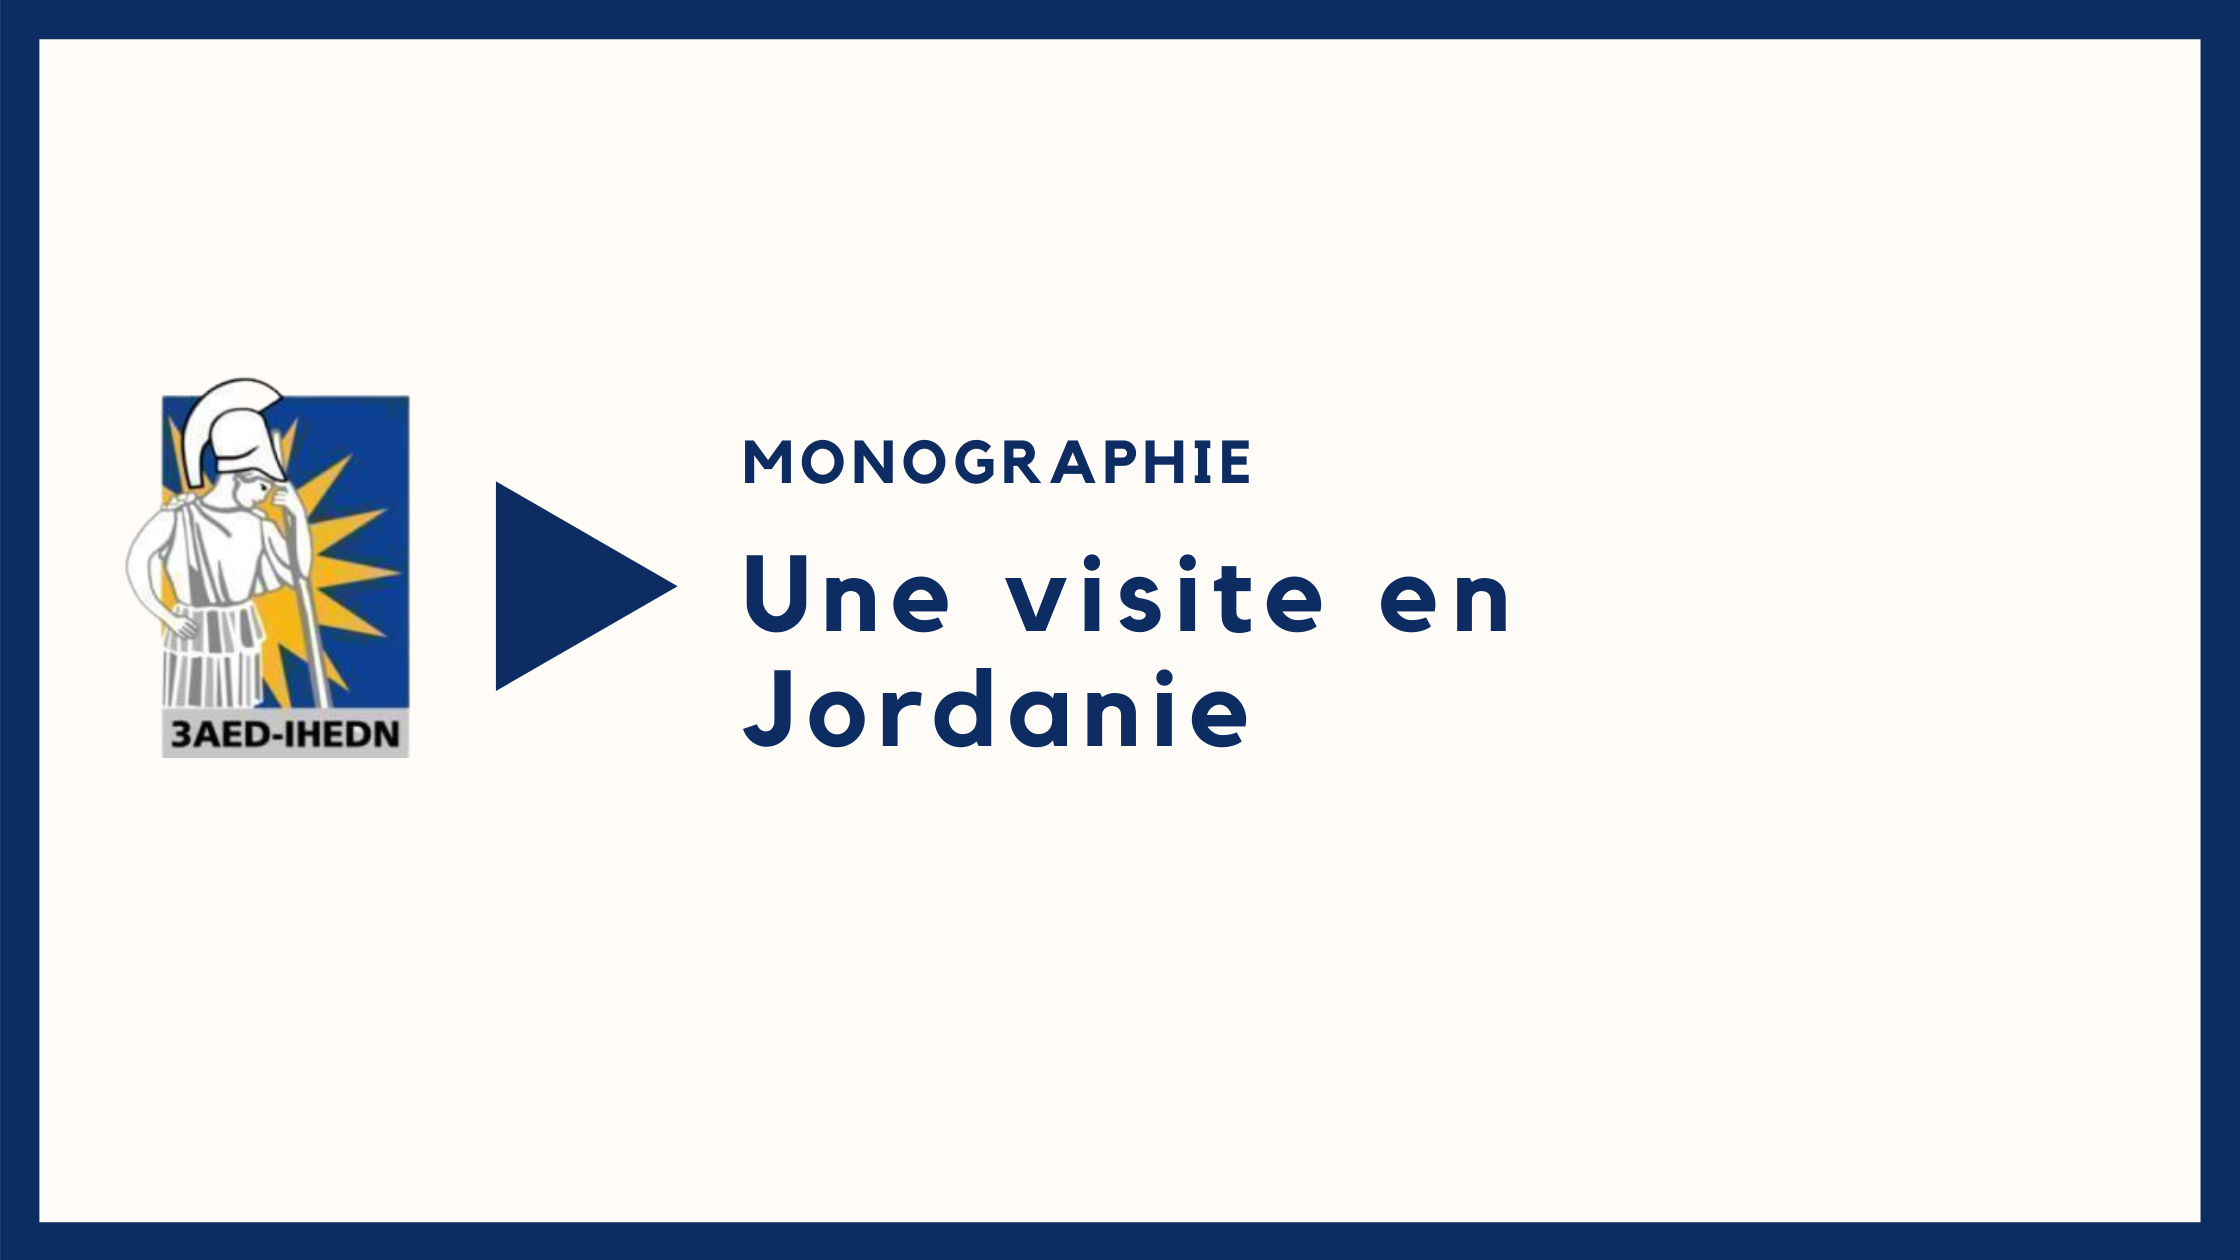 Monographie | Une visite en Jordanie